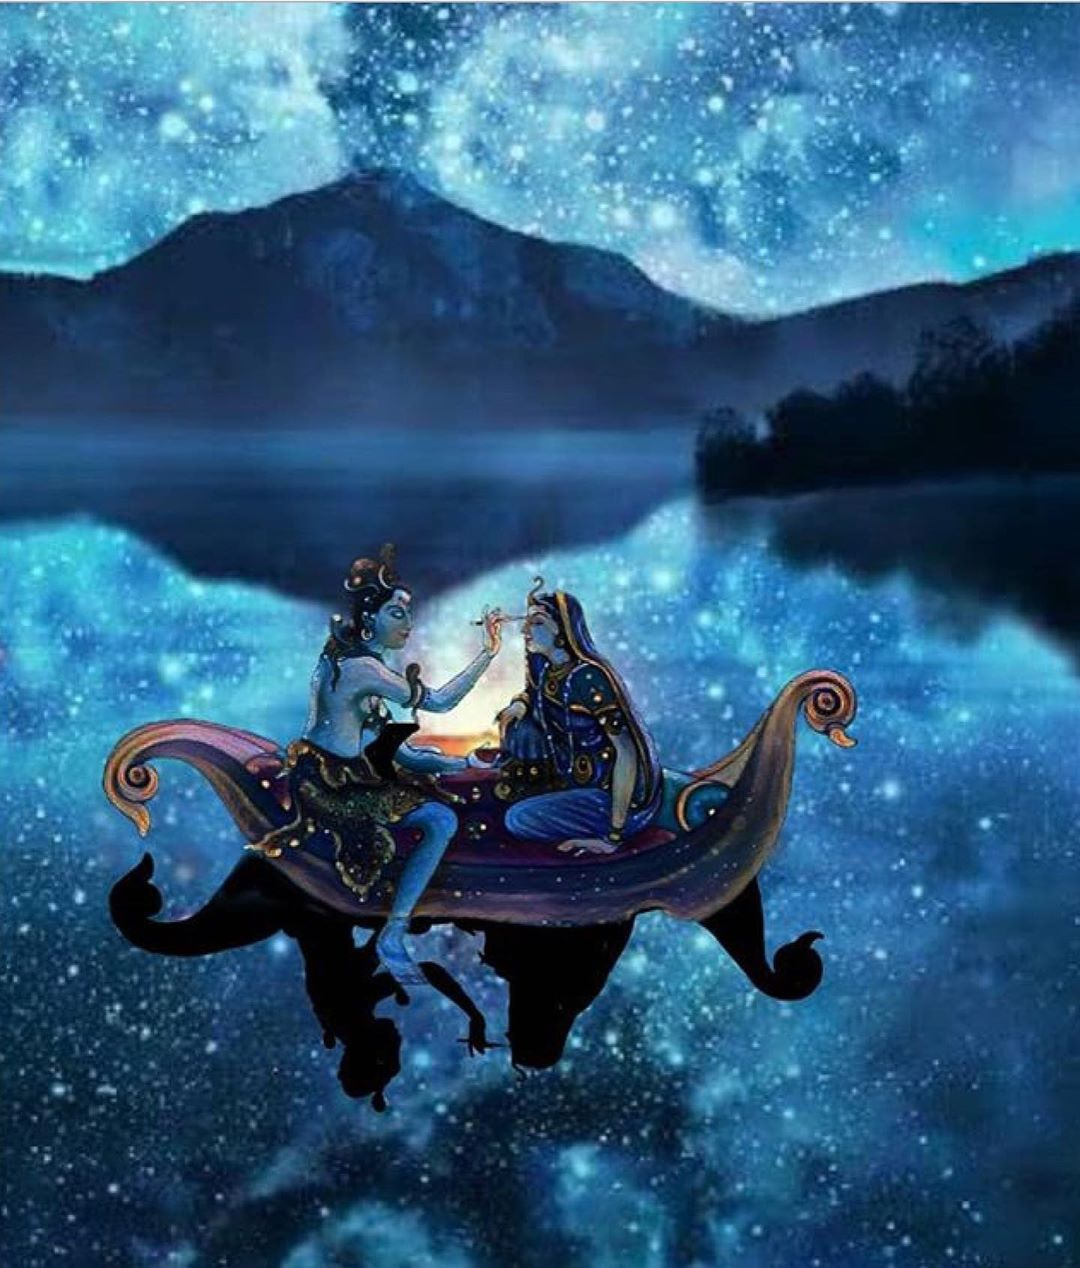 Free Download Amazing Mahakal Wallpaper Lord Shiva Images Lyrics Tune